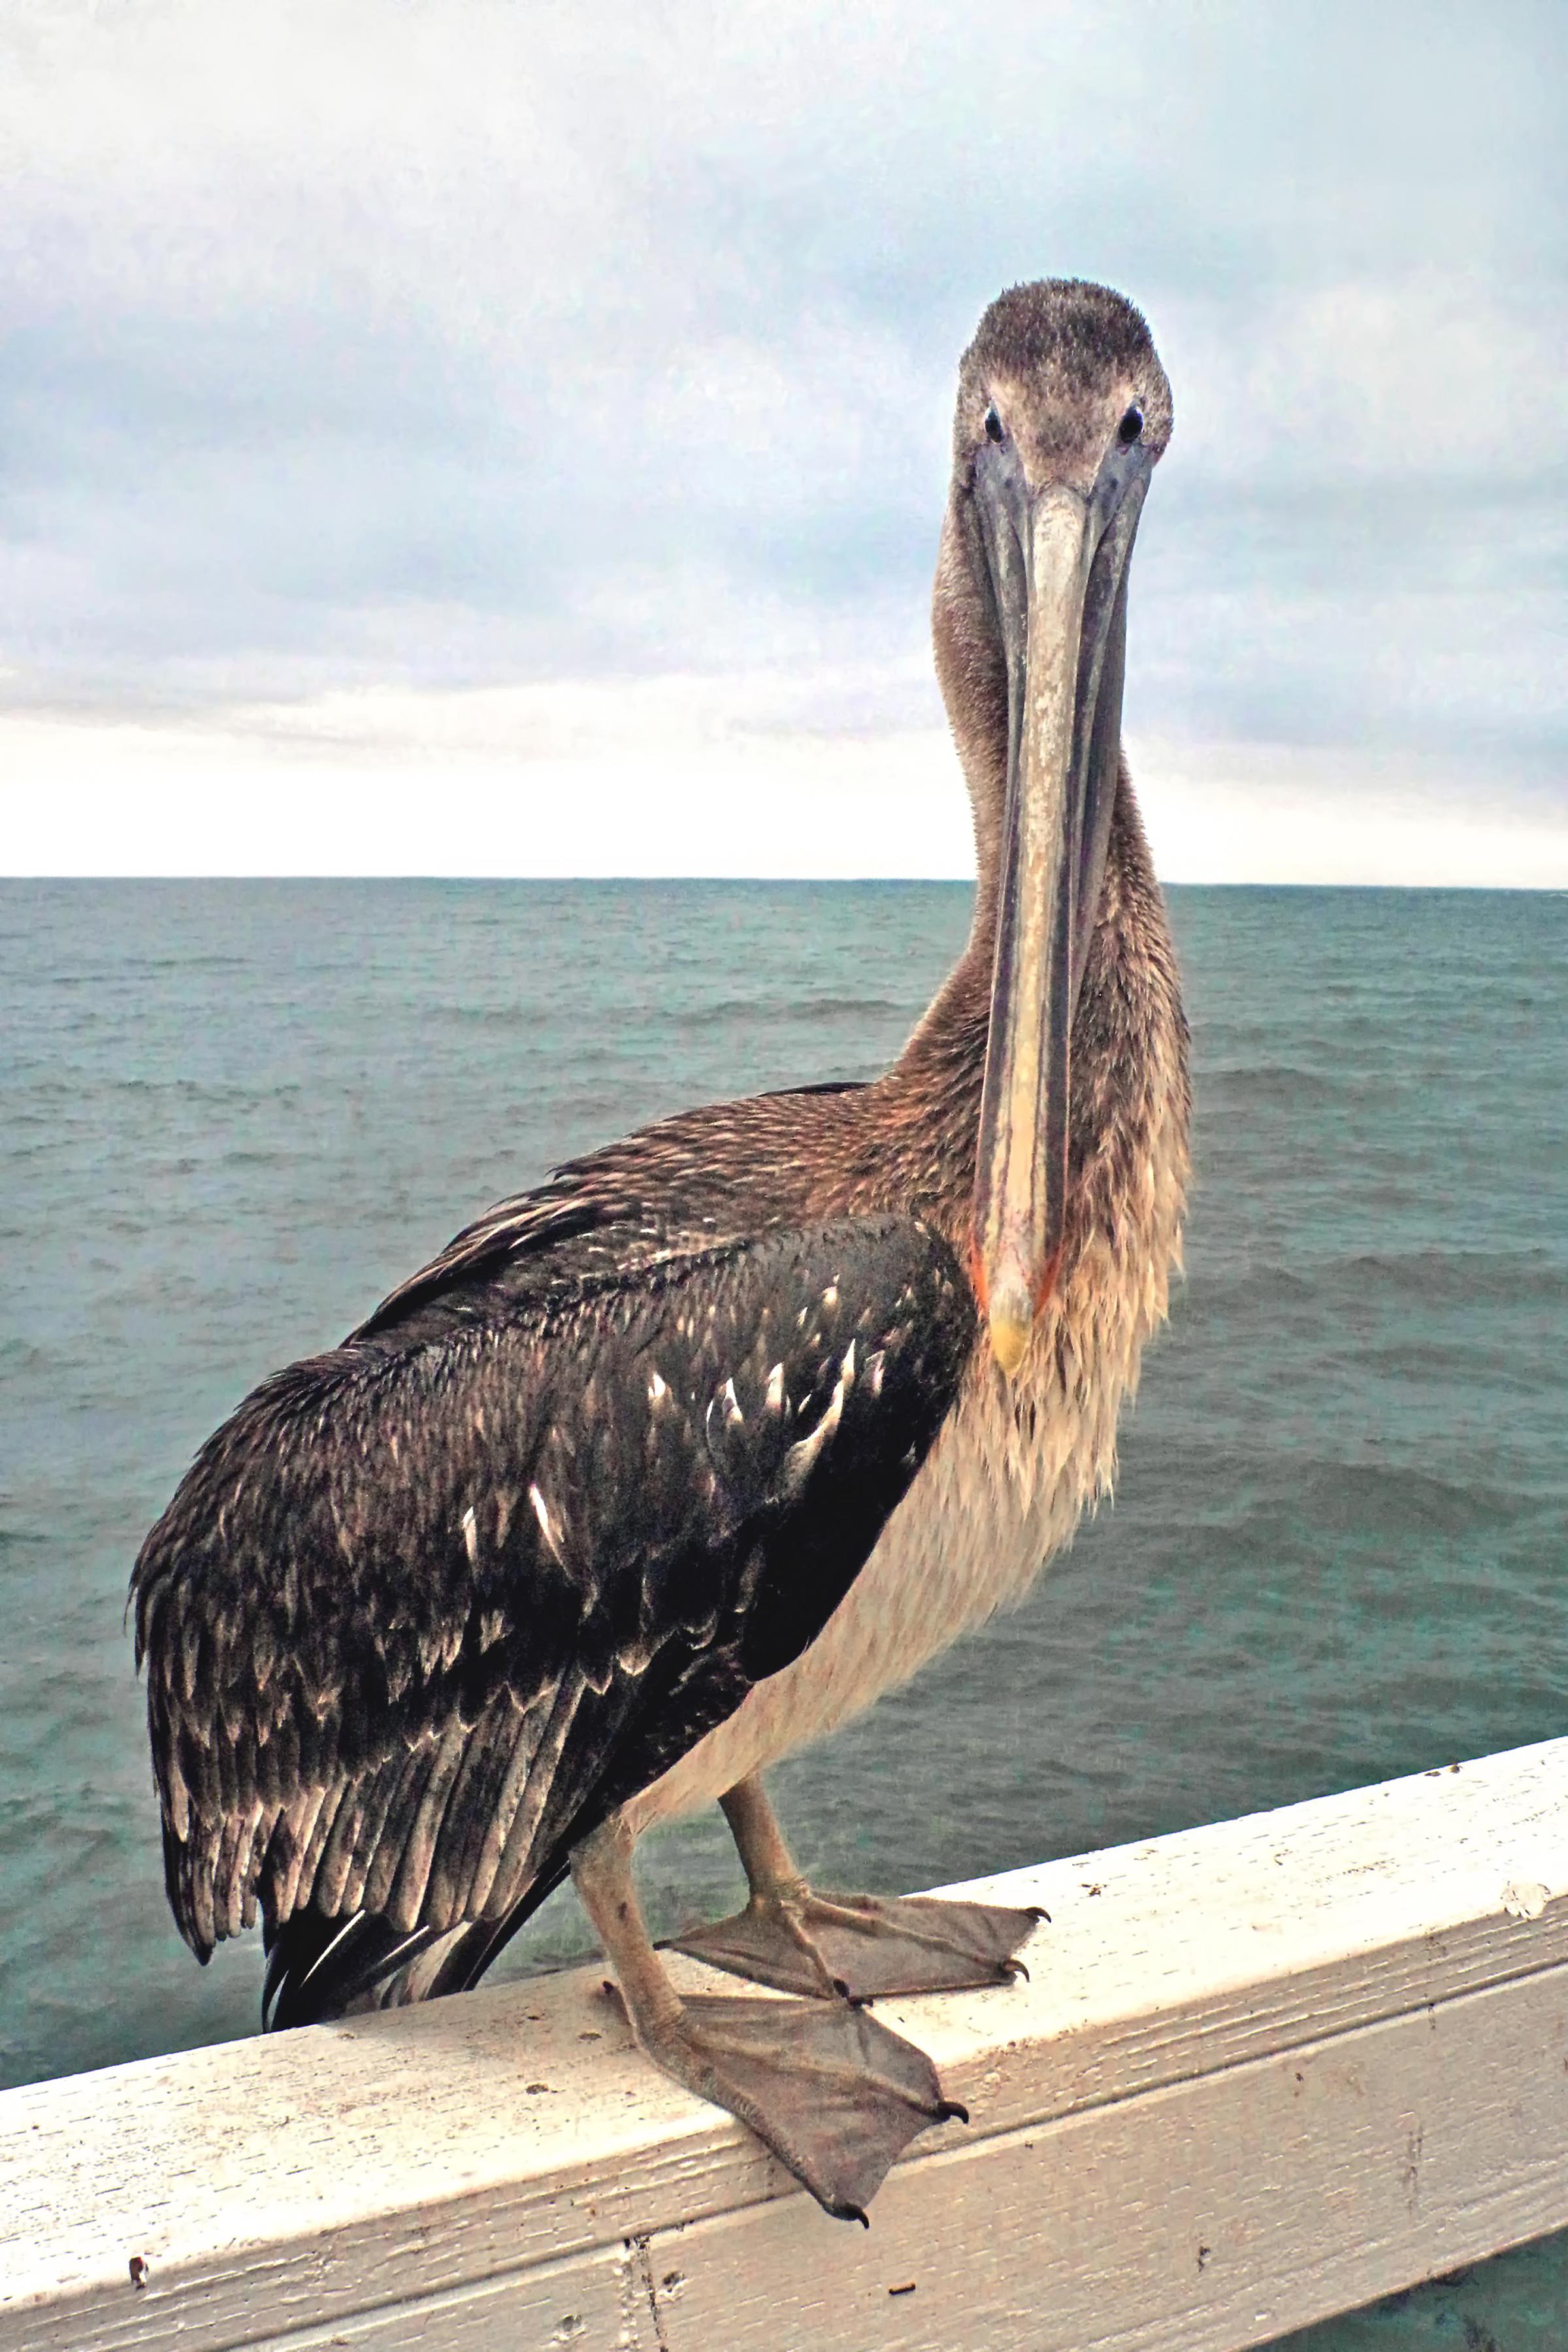 Larry, the Brown Pelican